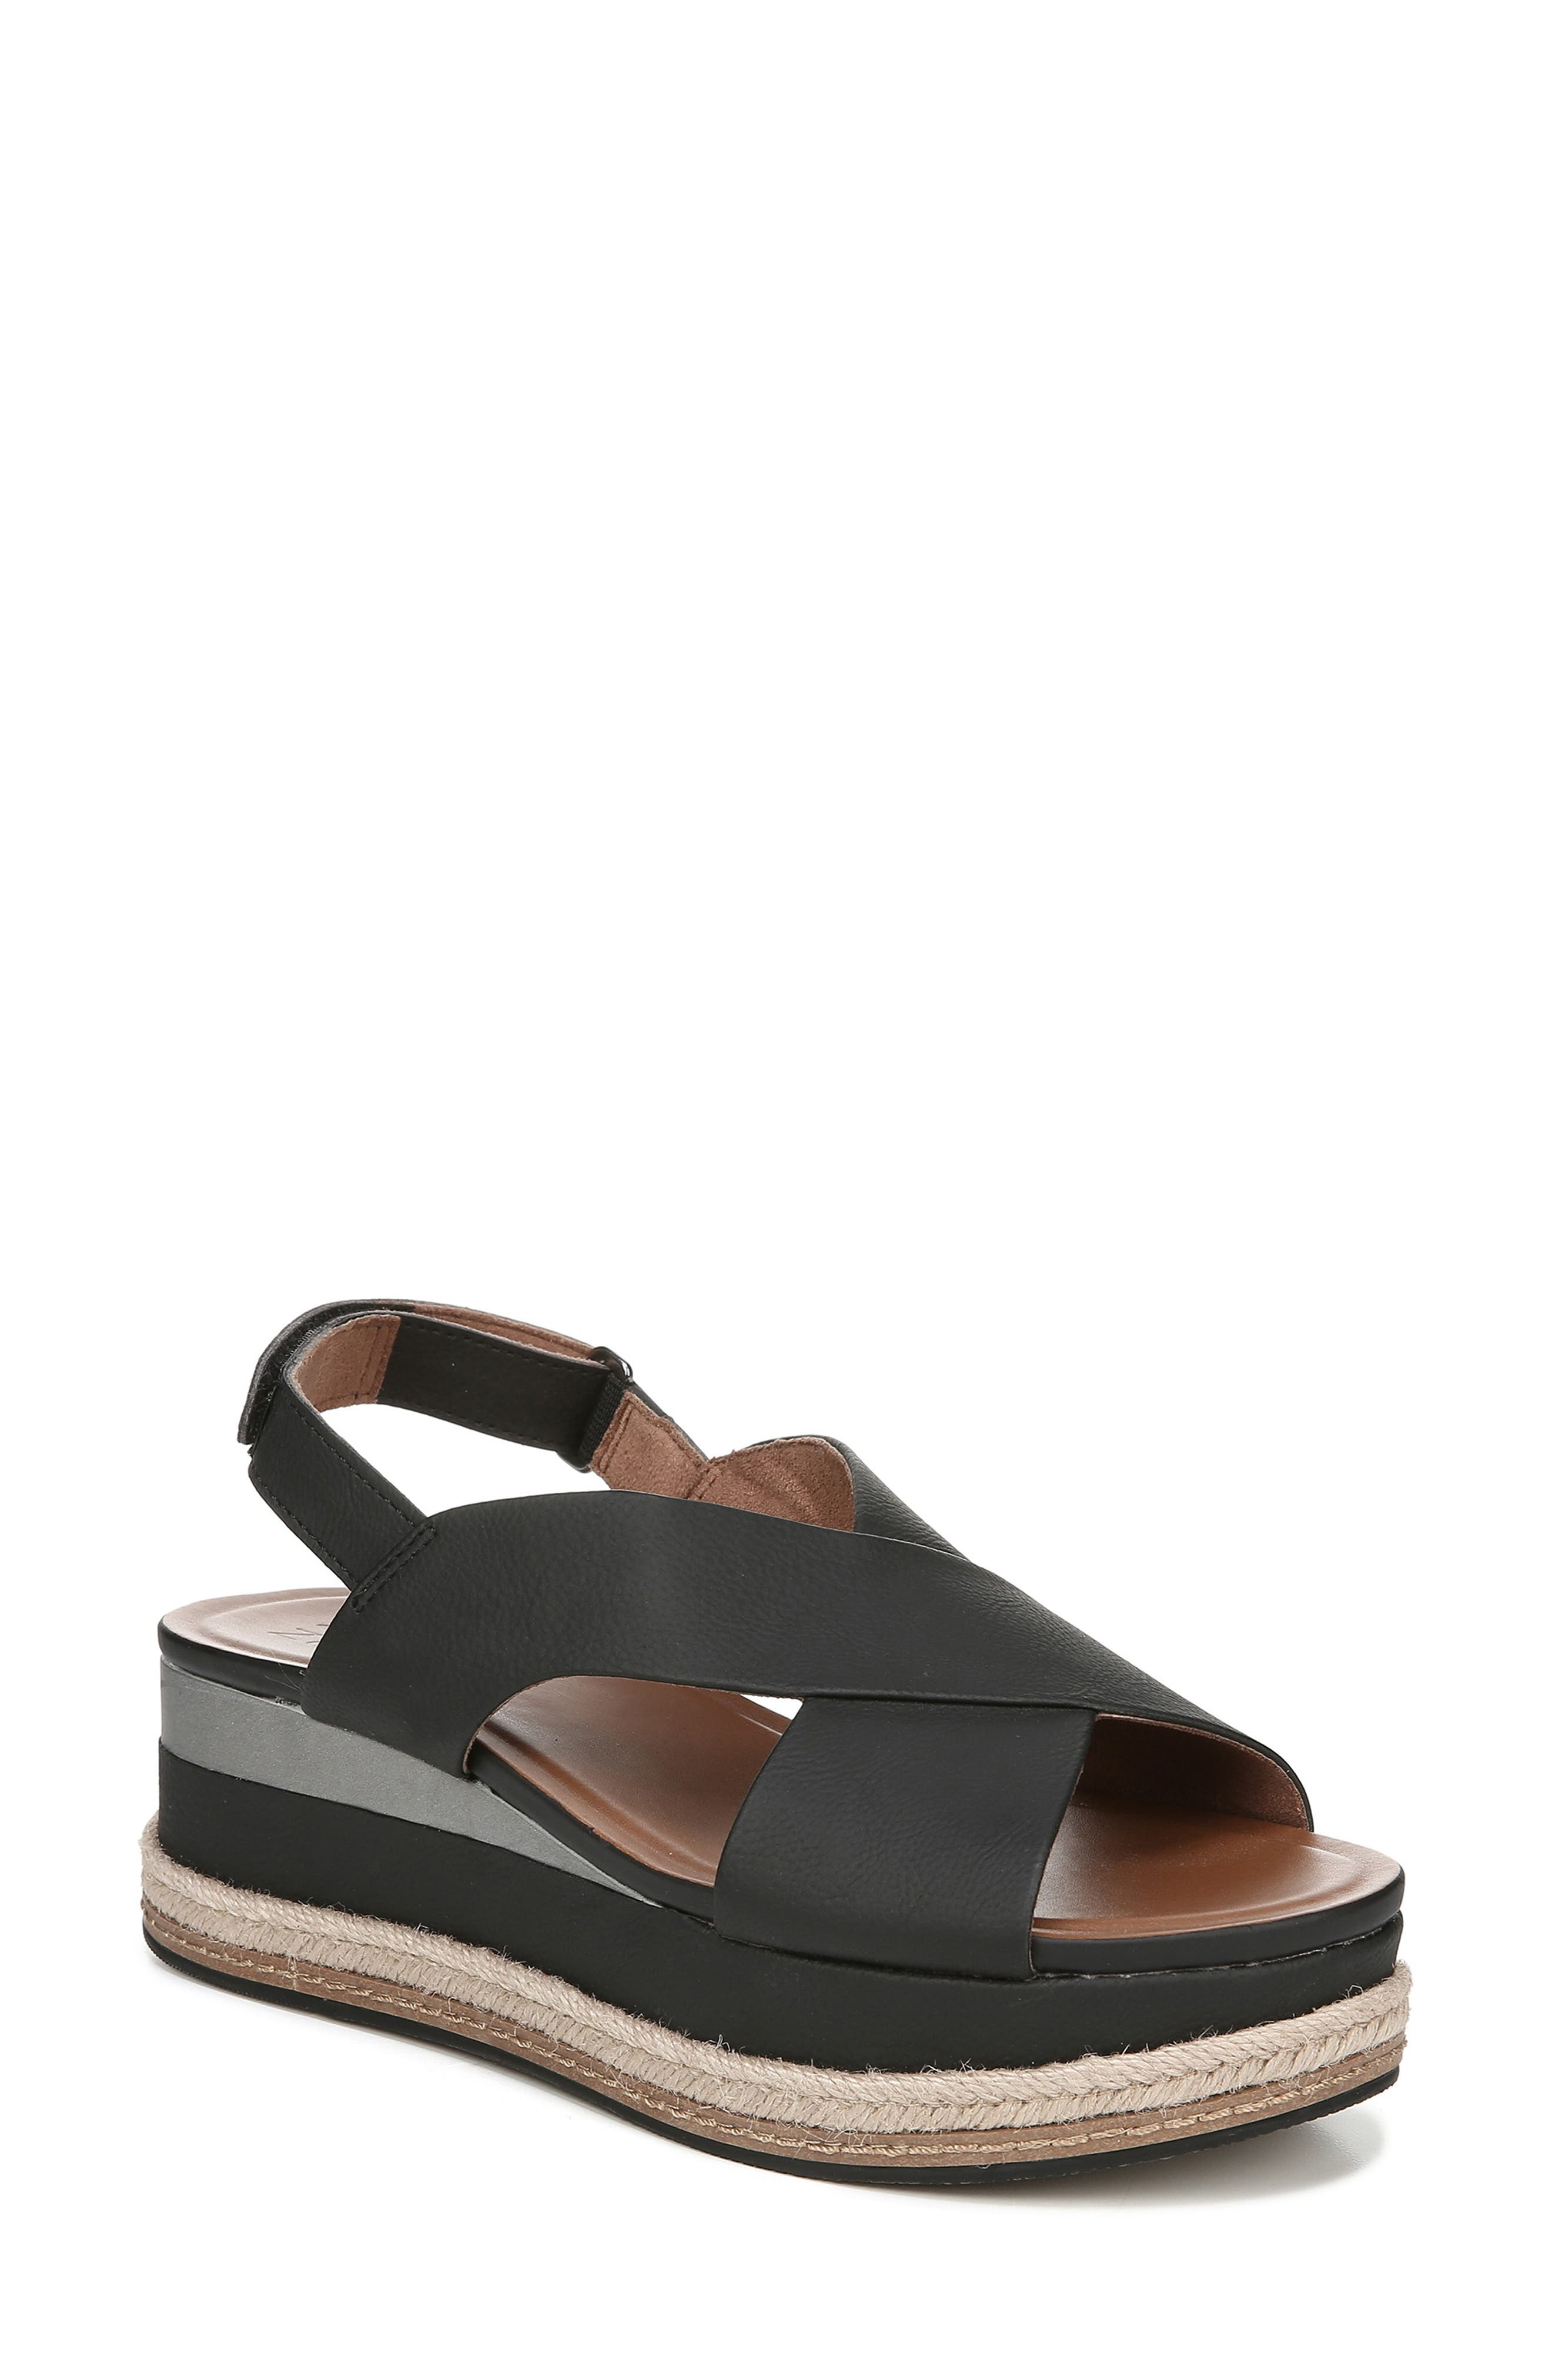 Naturalizer Baya Espadrille Wedge Sandal, Black